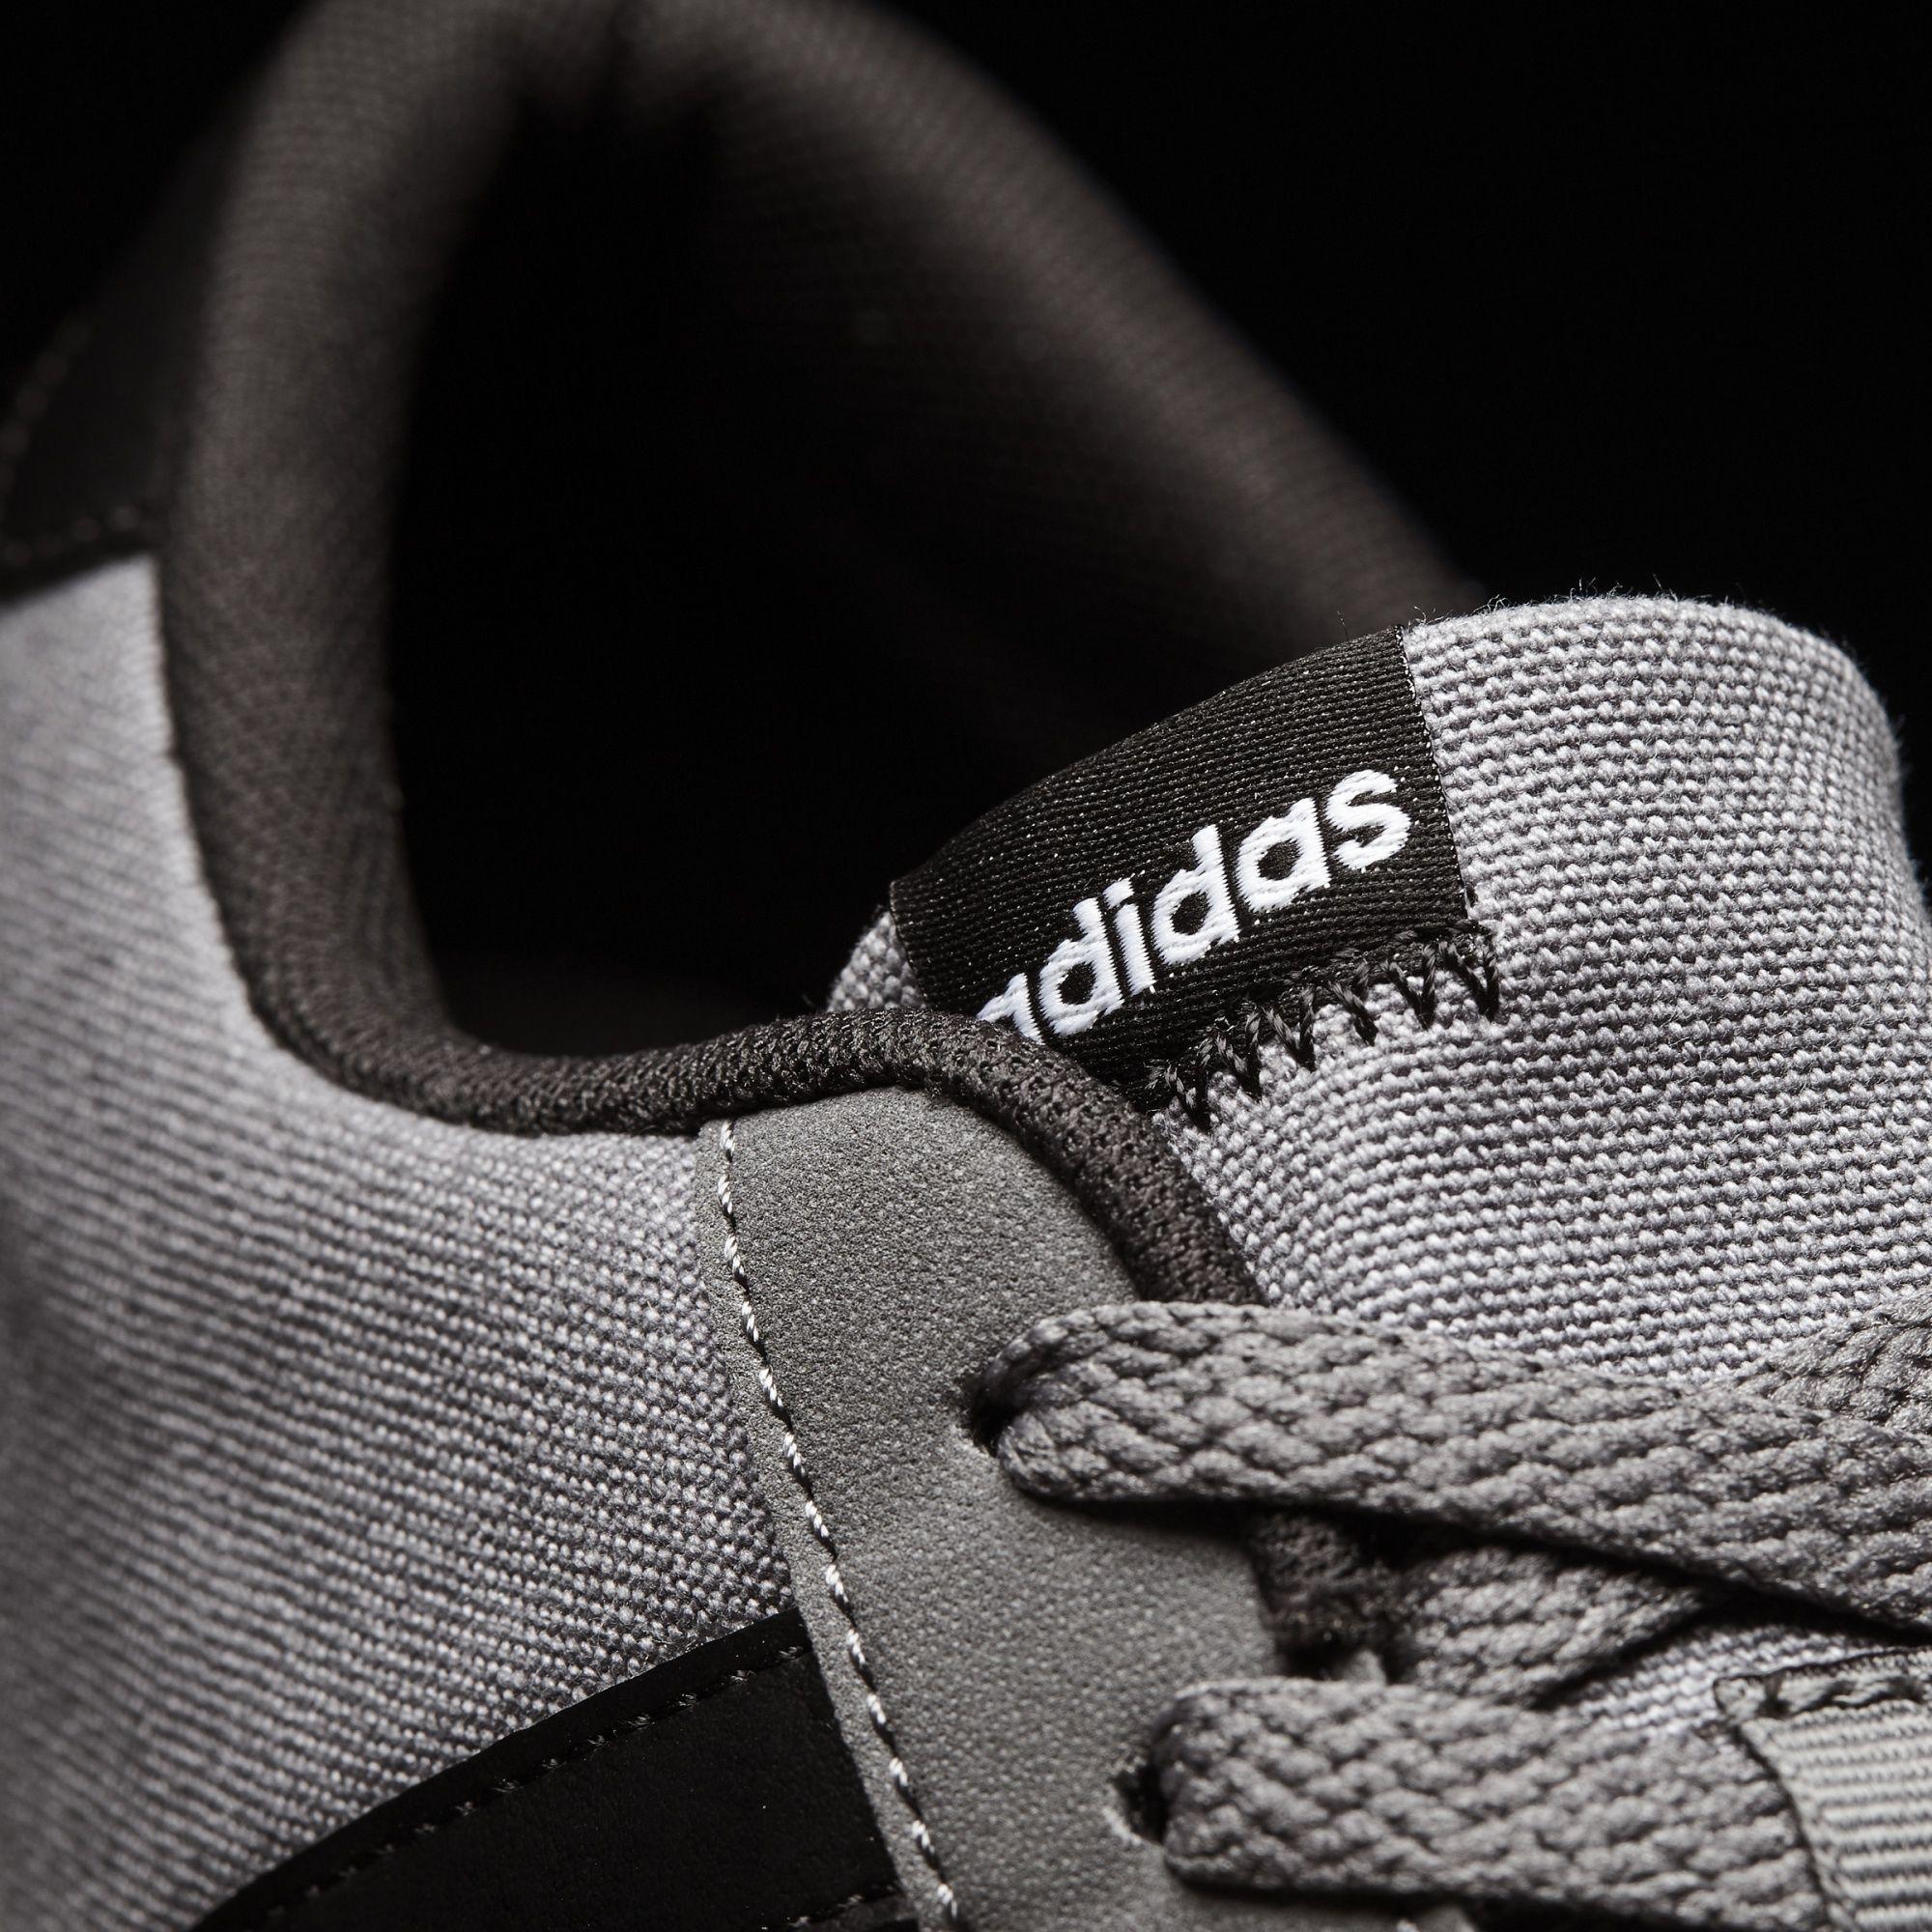 separation shoes f680f f8c64 Adidas Sepatu Sneaker AdiNeo VS Skate - B74222 - Abu - 5 .